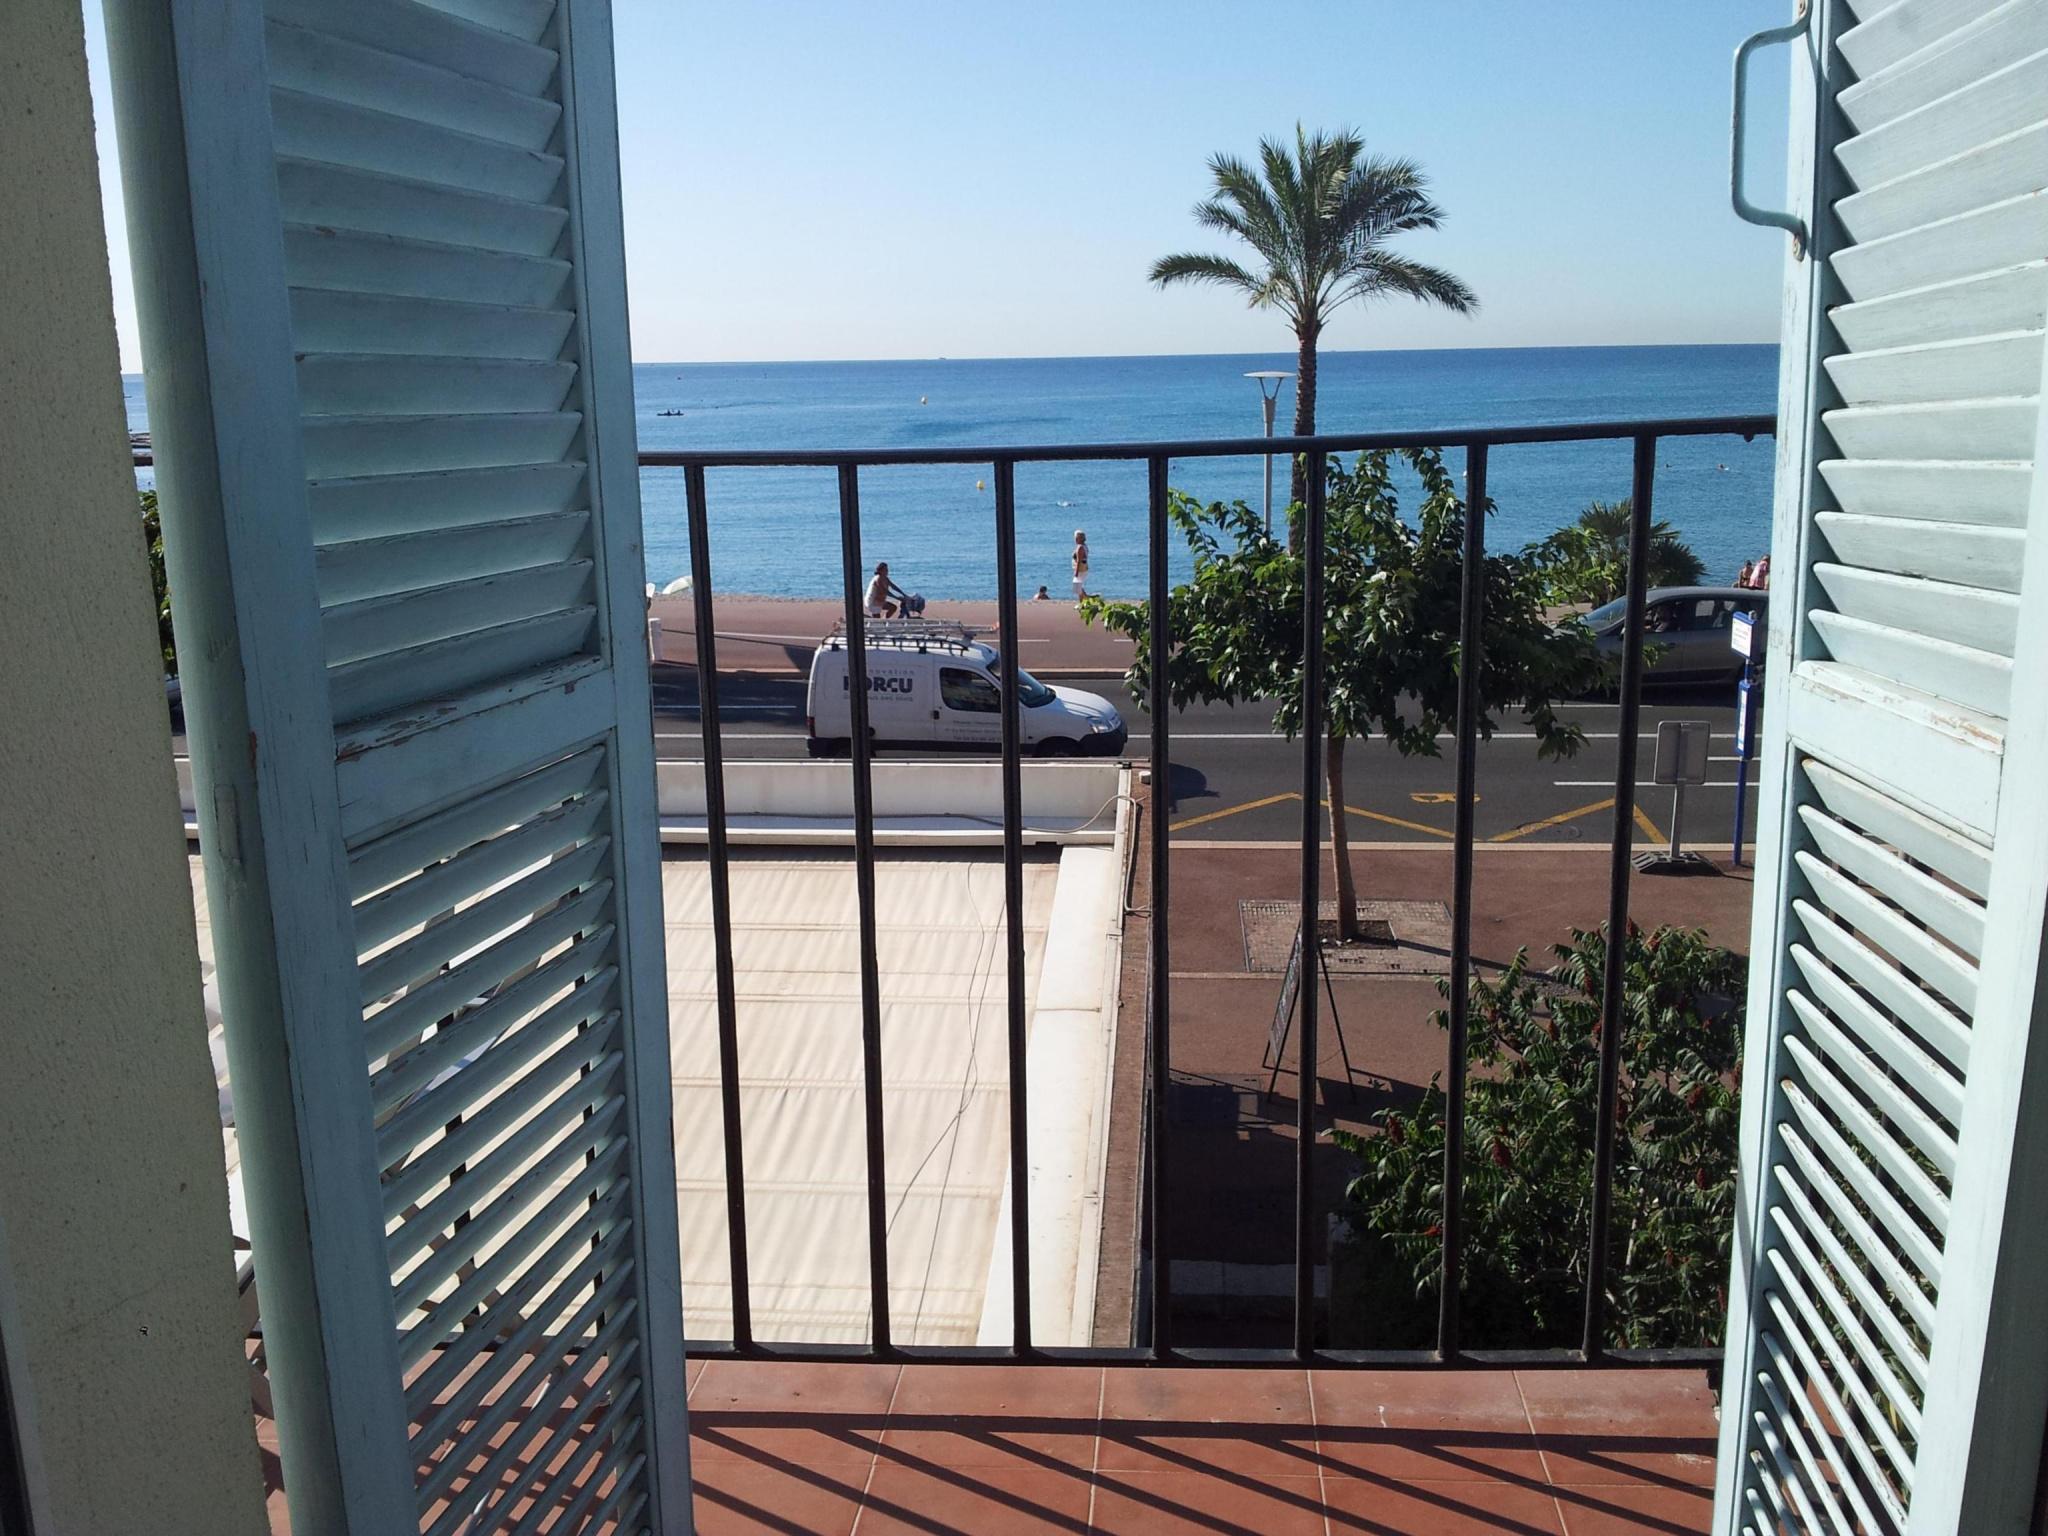 HÃŽtel restaurant en bord de mer Antibes â?? Nice - Hôtel Restaurant